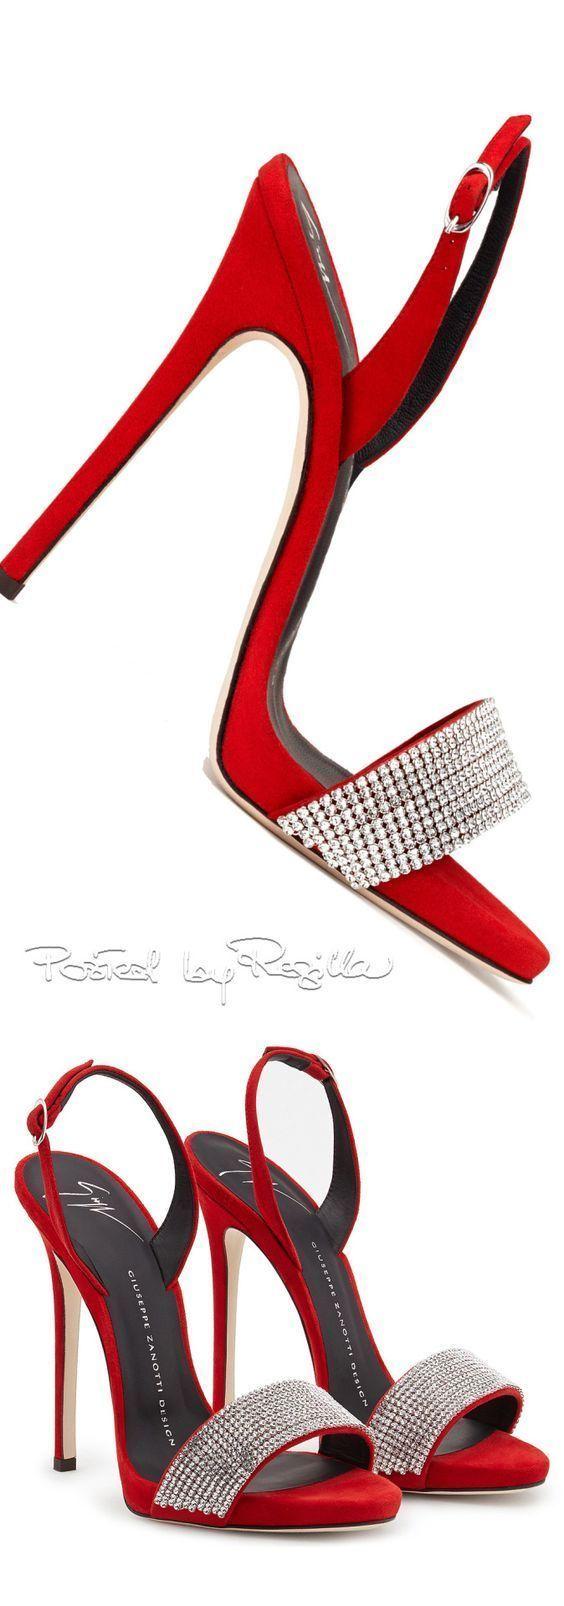 History of high heels fashion 27